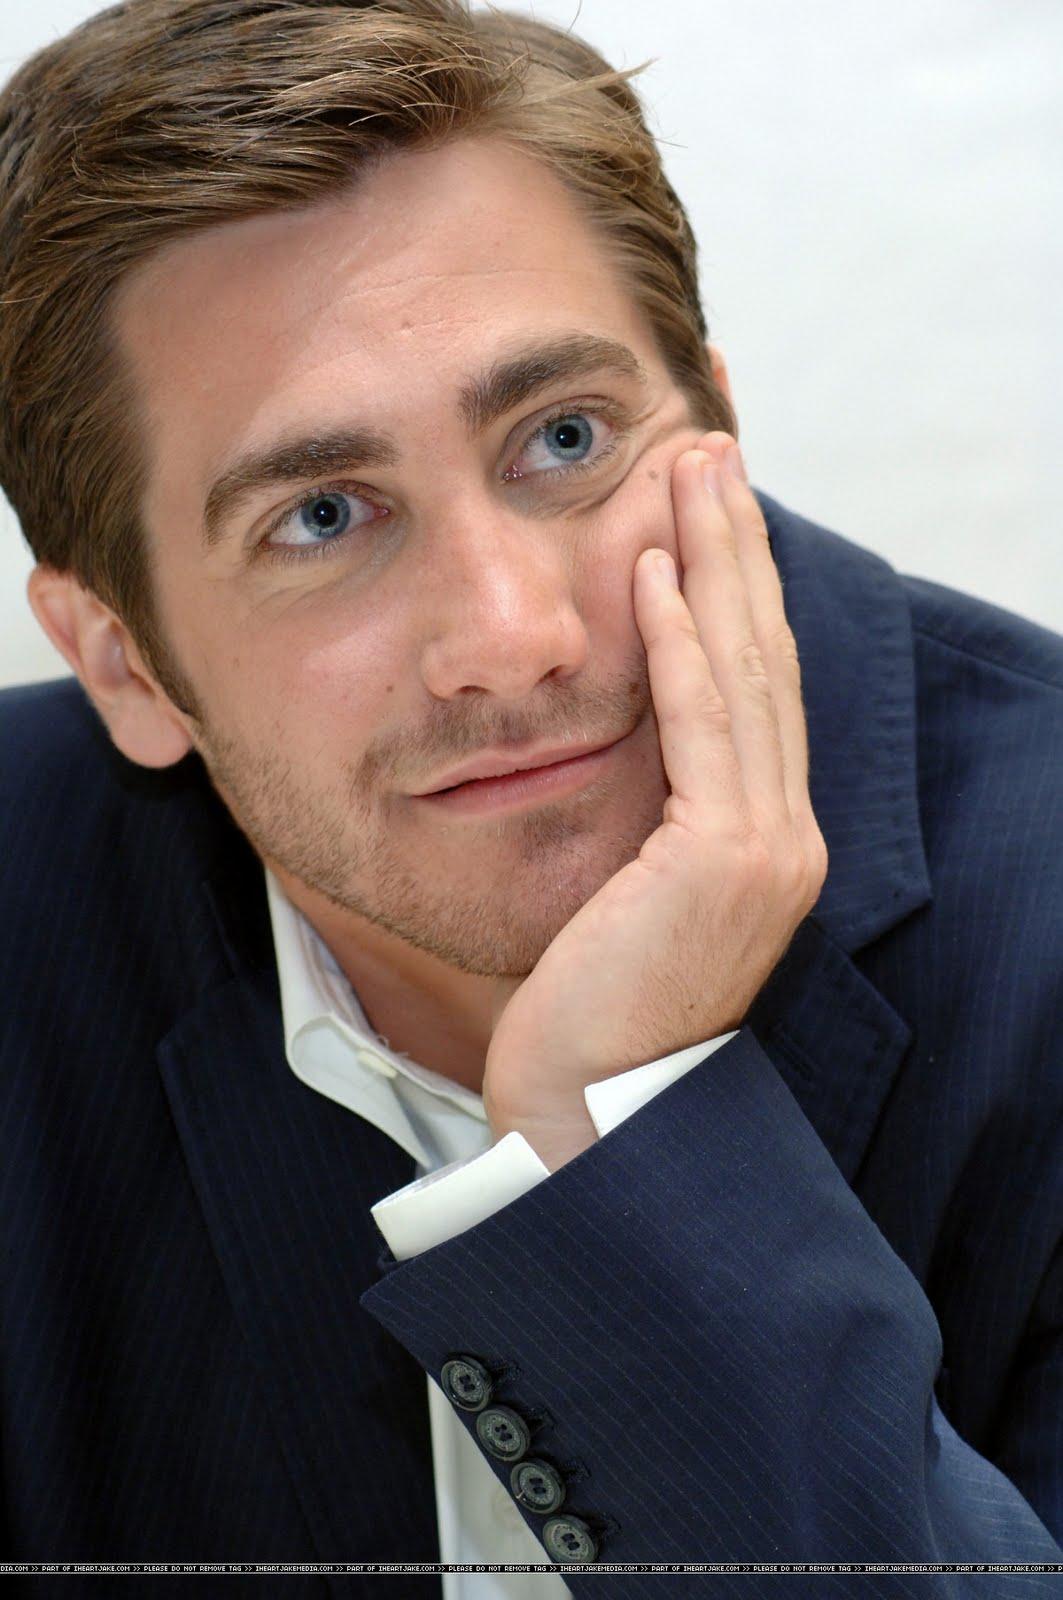 Jake Gyllenhaal - Hottest Actors Wallpaper (2966163) - Fanpop |Old Jake Gyllenhaal